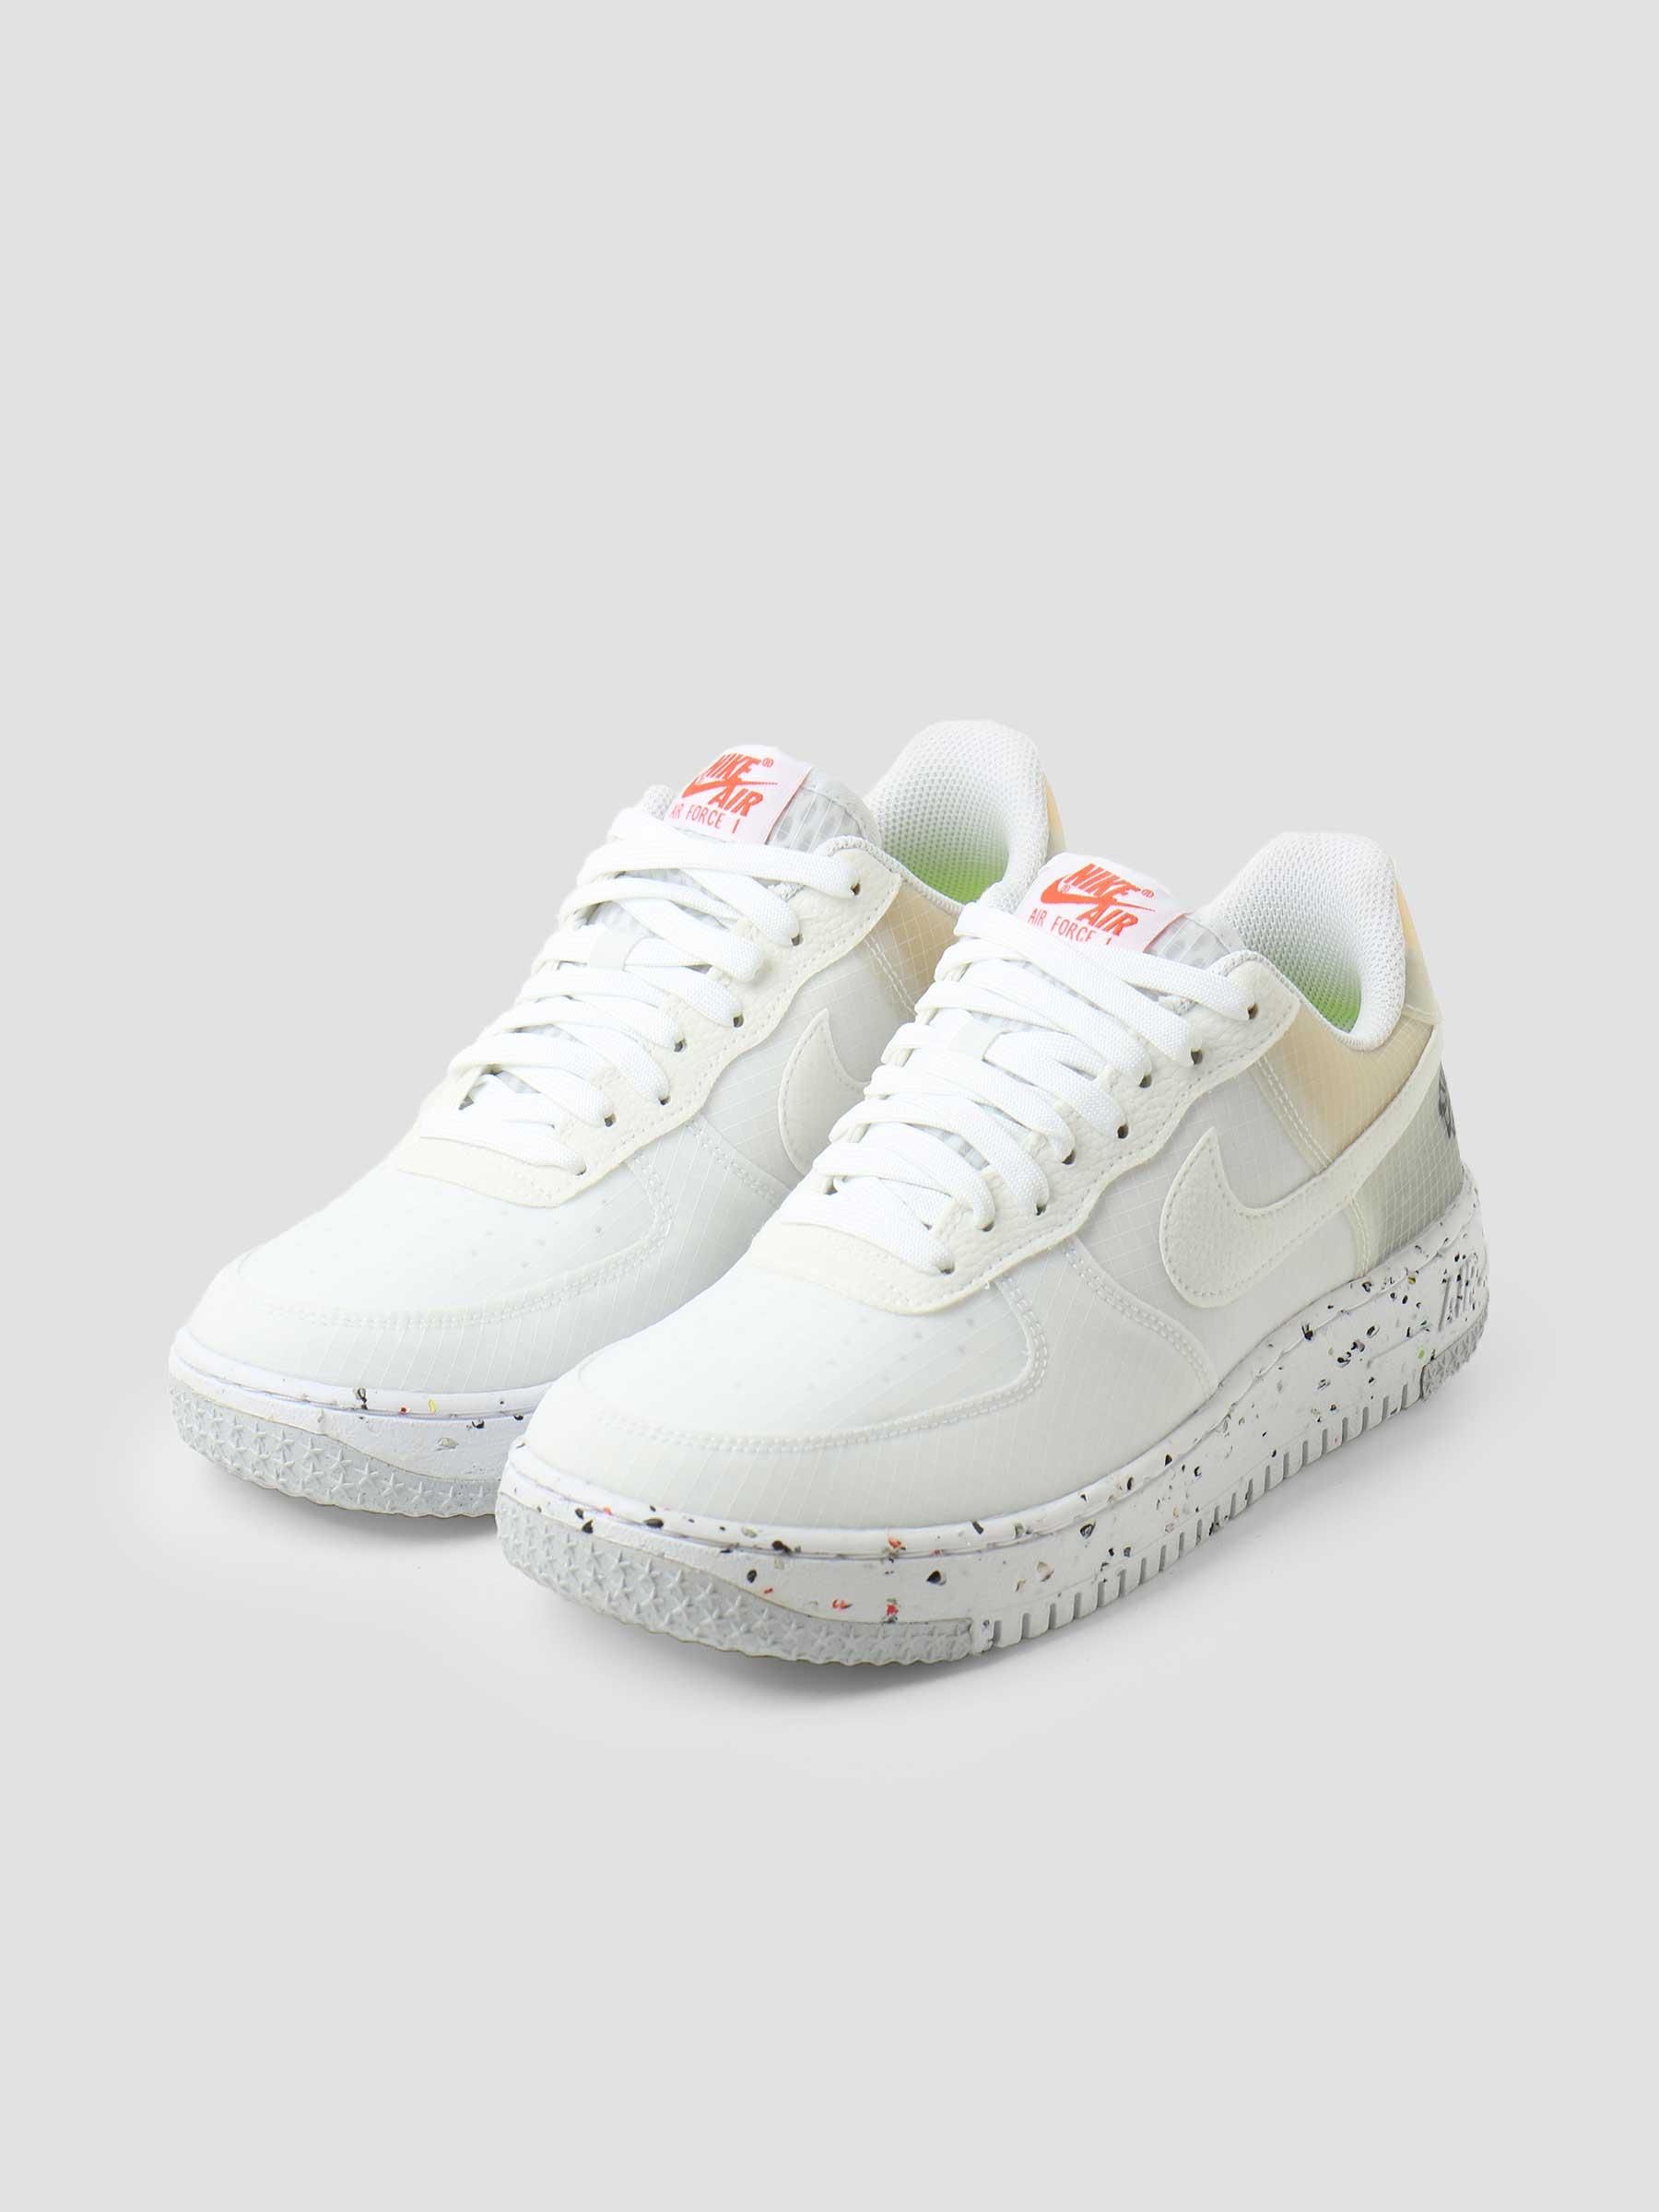 Nike Air Force 1 Crater White White Orange DH2521-100